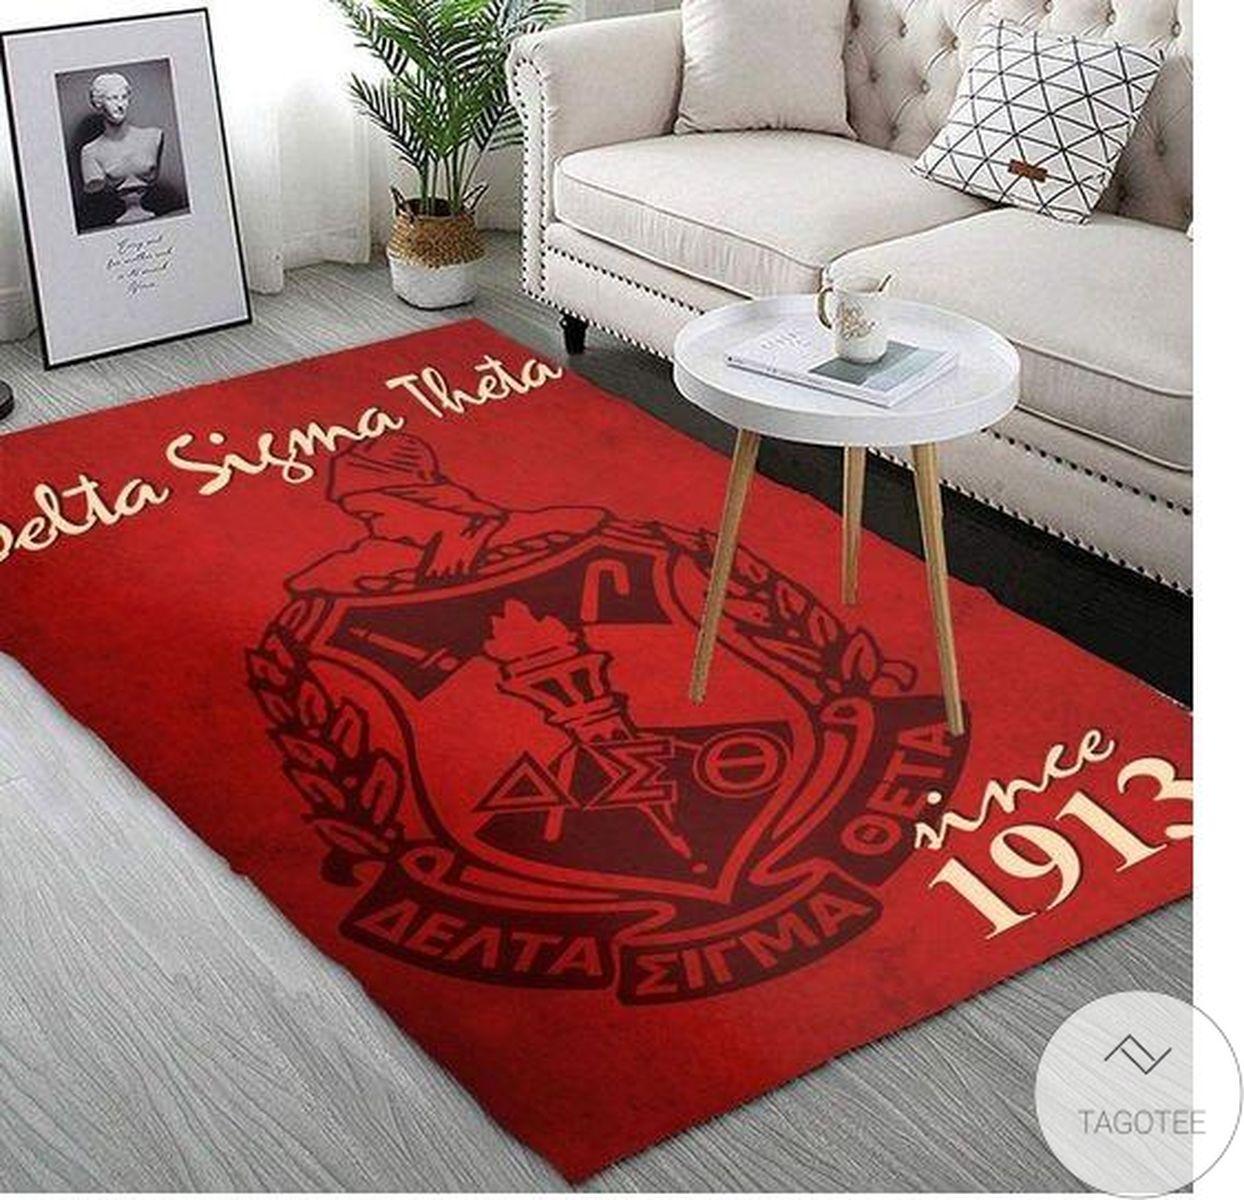 Hot Deal Delta Sigma Theta Since 1913 Soror Inc Crest Crimson Background Rug